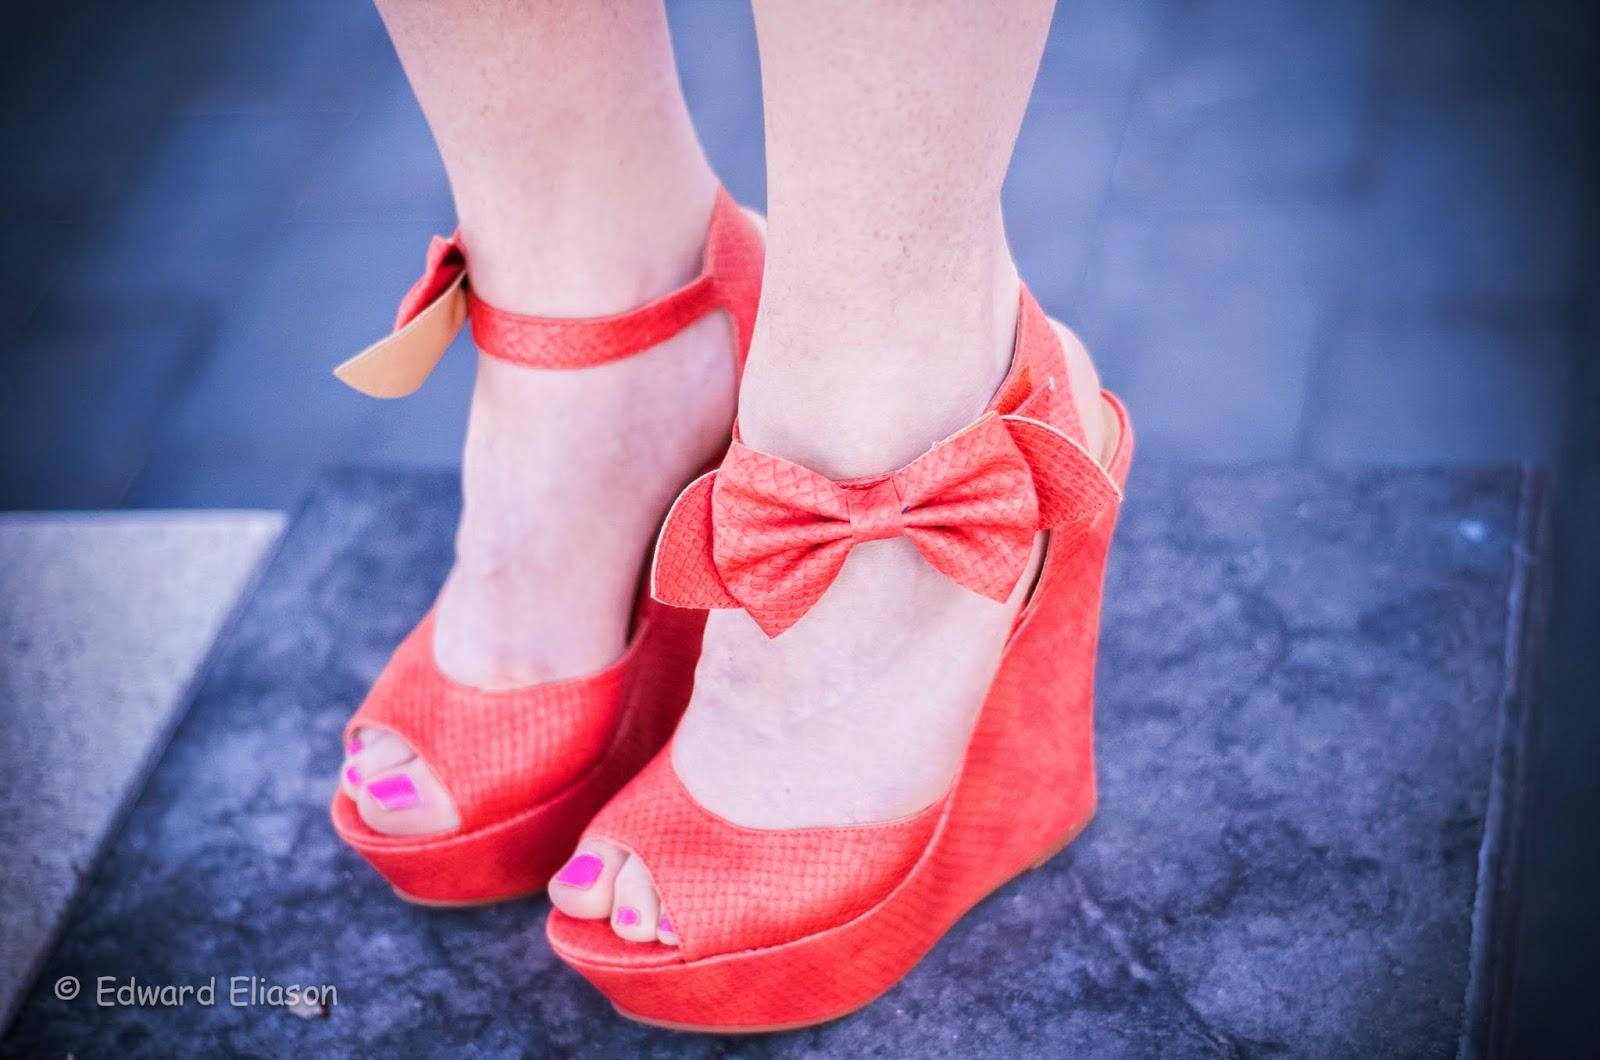 AMI Clubwear, bow heels, bow wegdges, similar tory burch penny wedges, similar tory burch bow wedges, ami clubwear shoes, clubwear, wedges, pink bow wedges, cute, holliday bvld, holiday boulevard, pink toe nails, snake skin wedges,